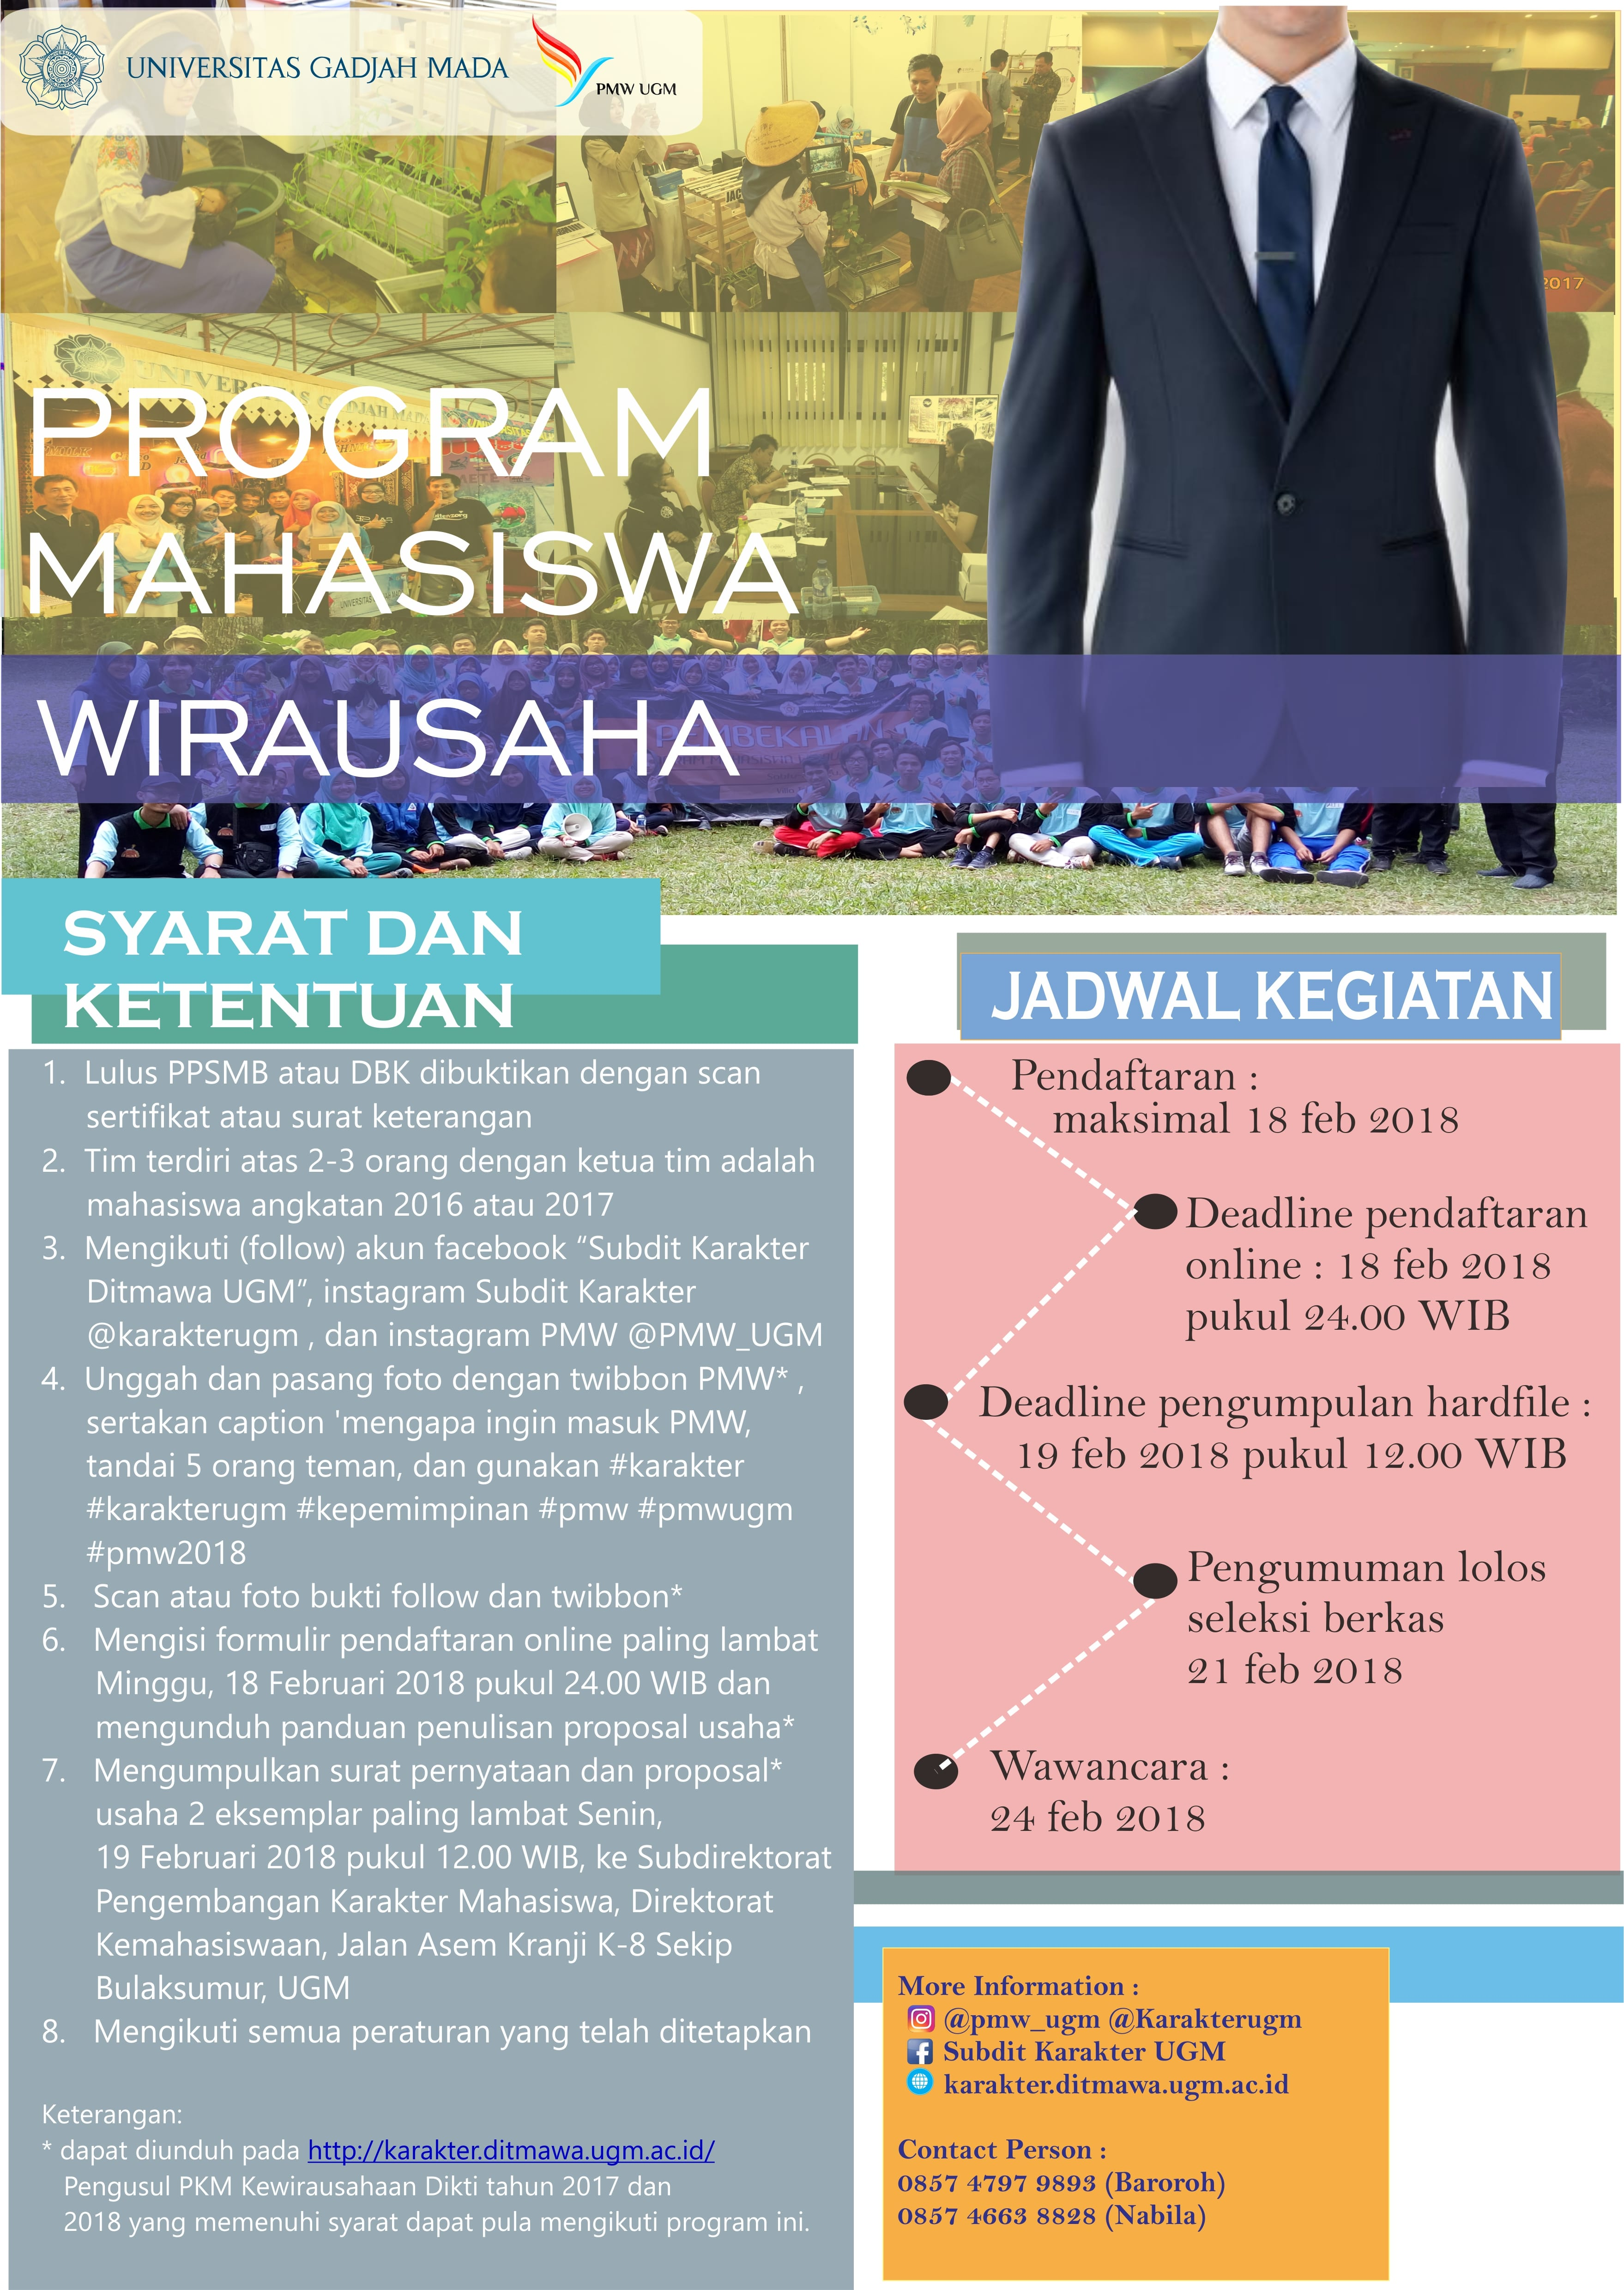 [INFORMASI] PENDAFTARAN PROGRAM WIRAUSAHA MAHASISWA (PMW) 2018